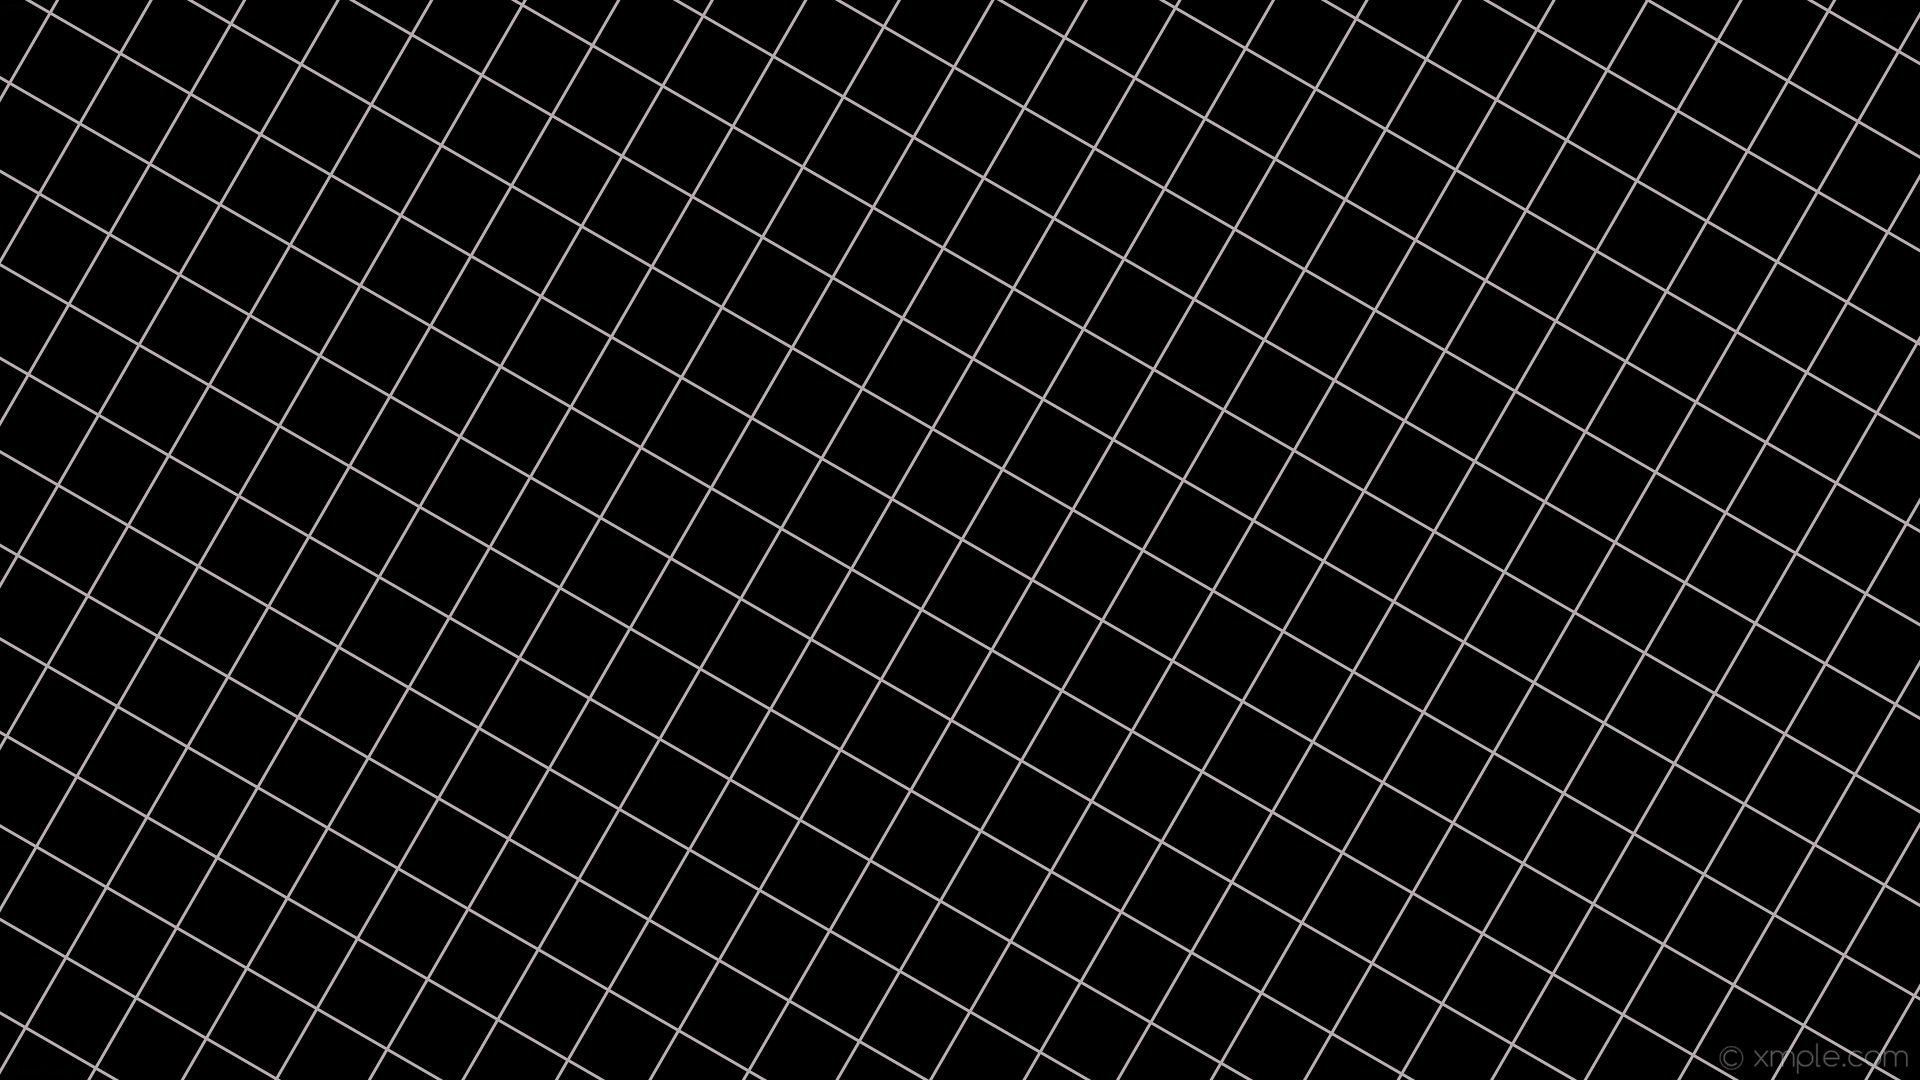 Aesthetic Black And White Wallpaper Mac 1920x1080